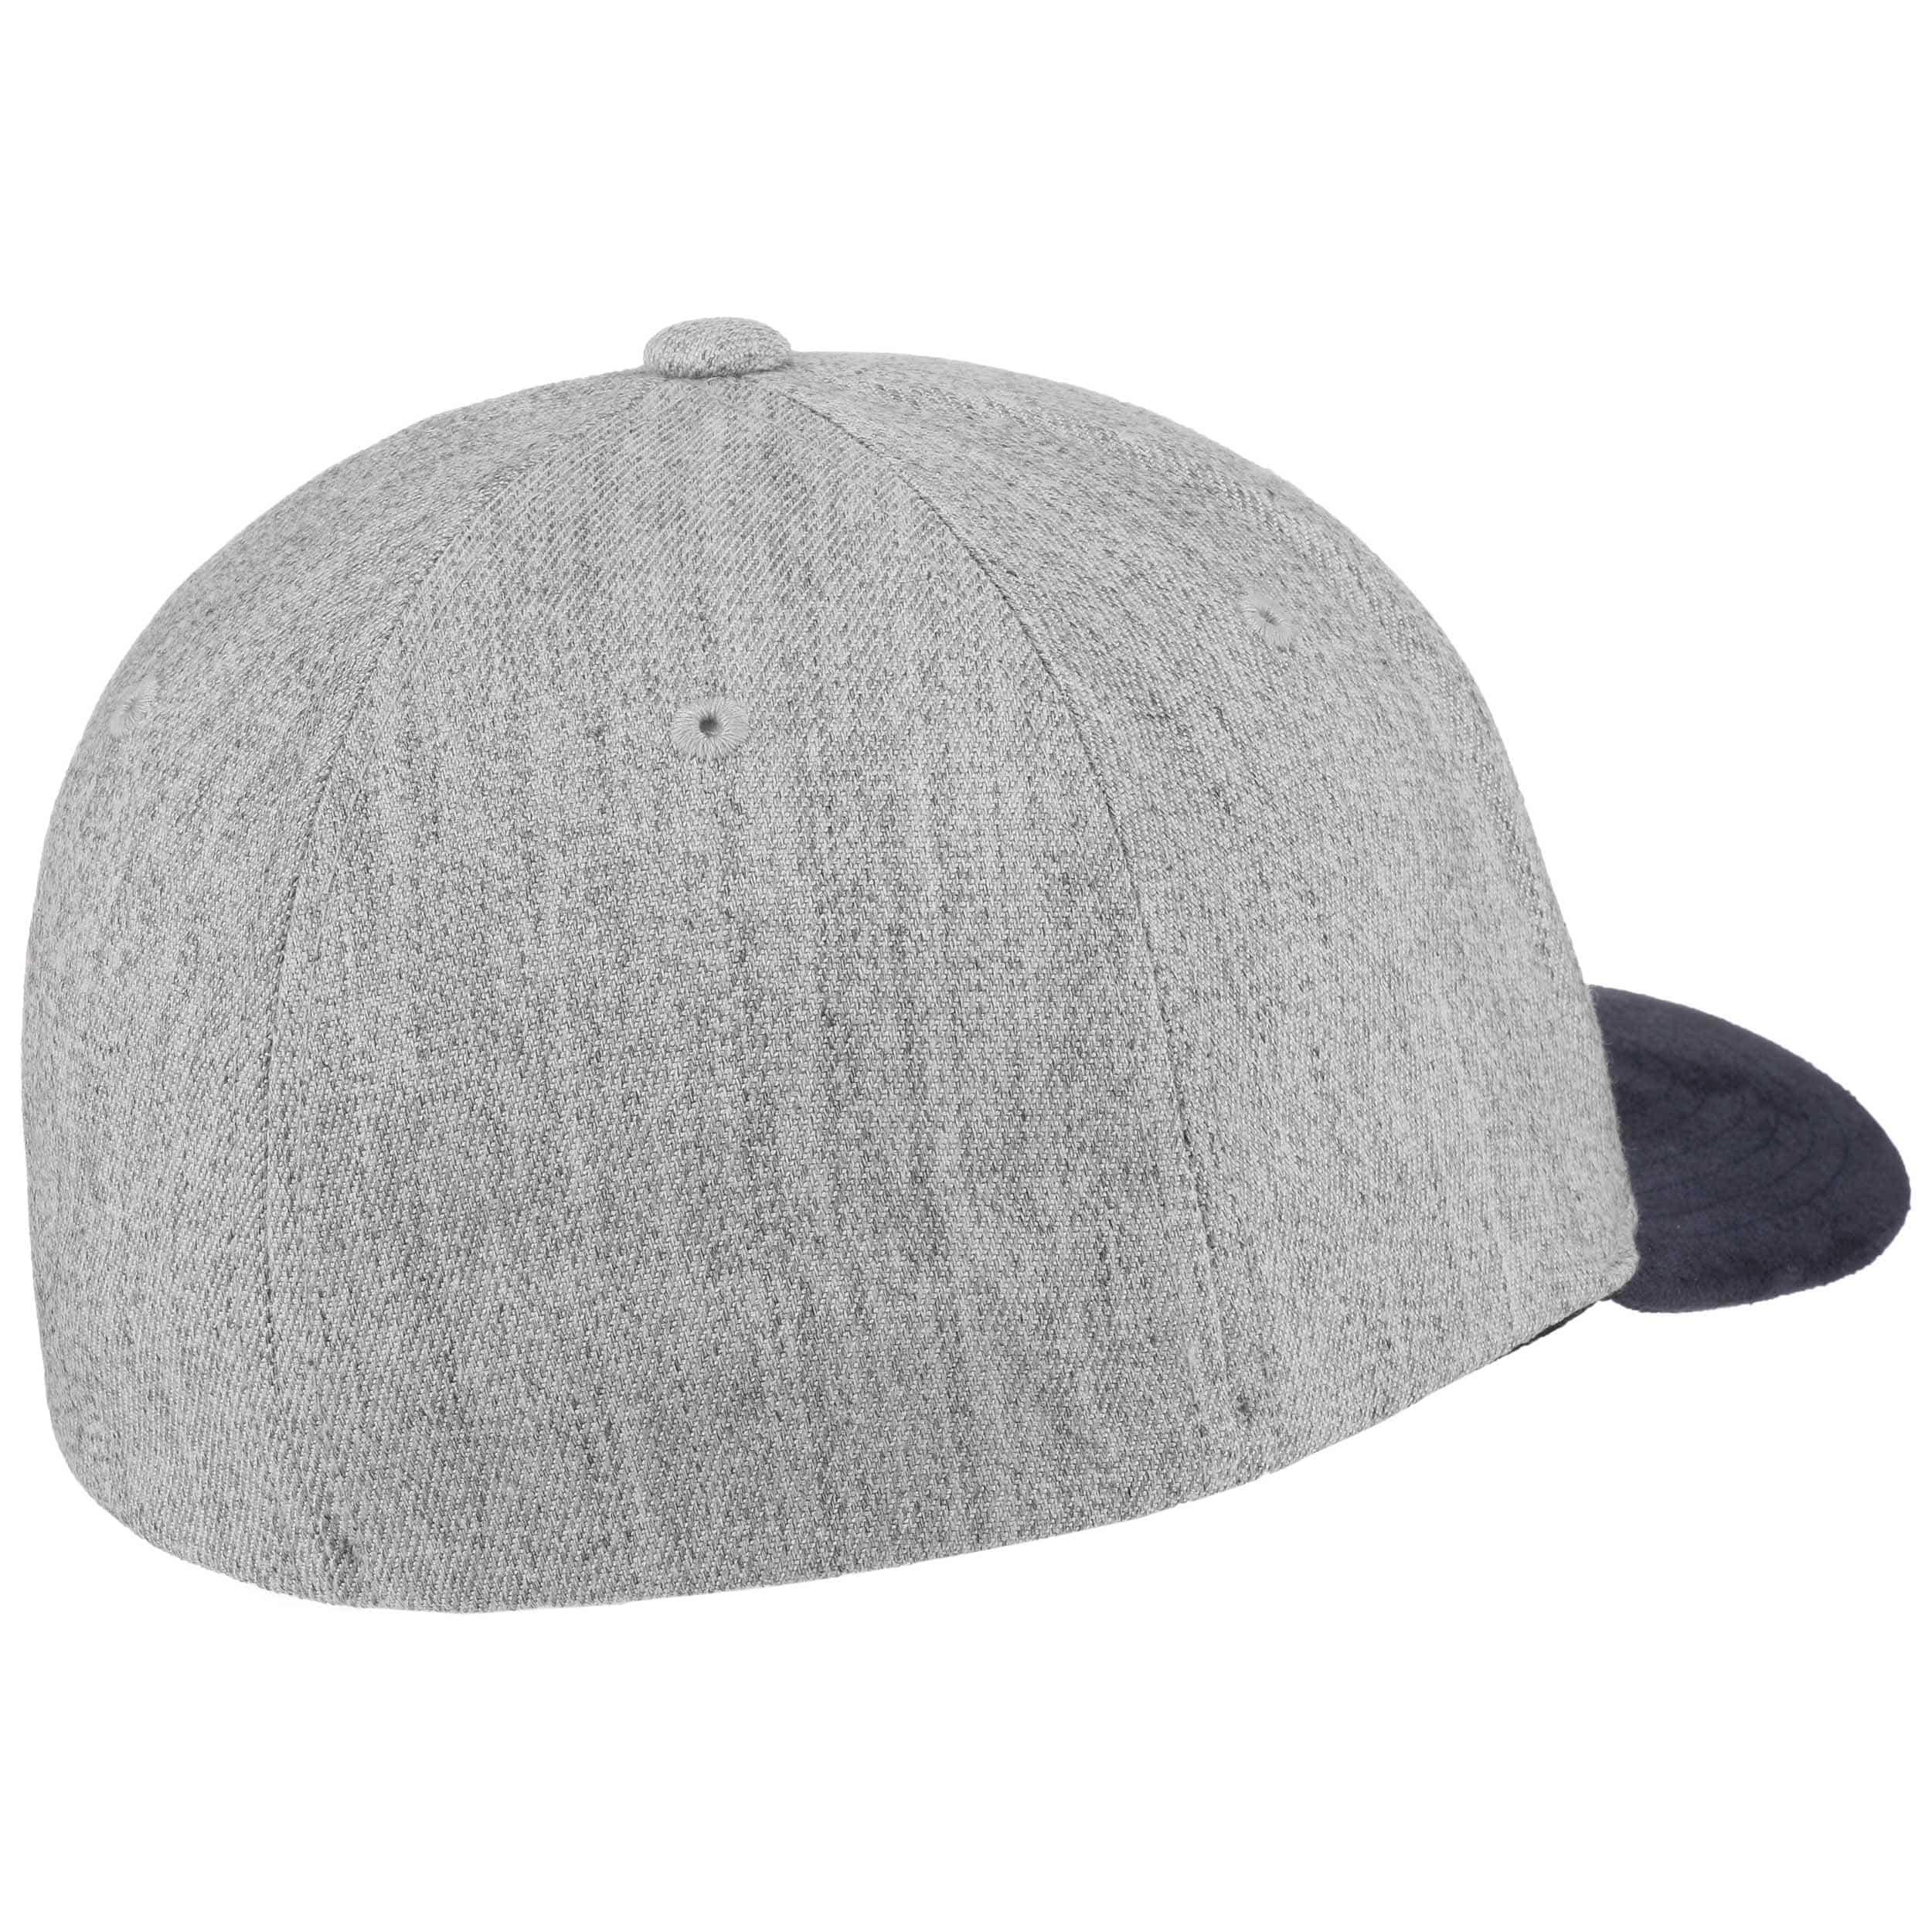 d8c782f26bd ... Full Stone Heather X Fit Cap by Volcom - grey-blue 4 ...